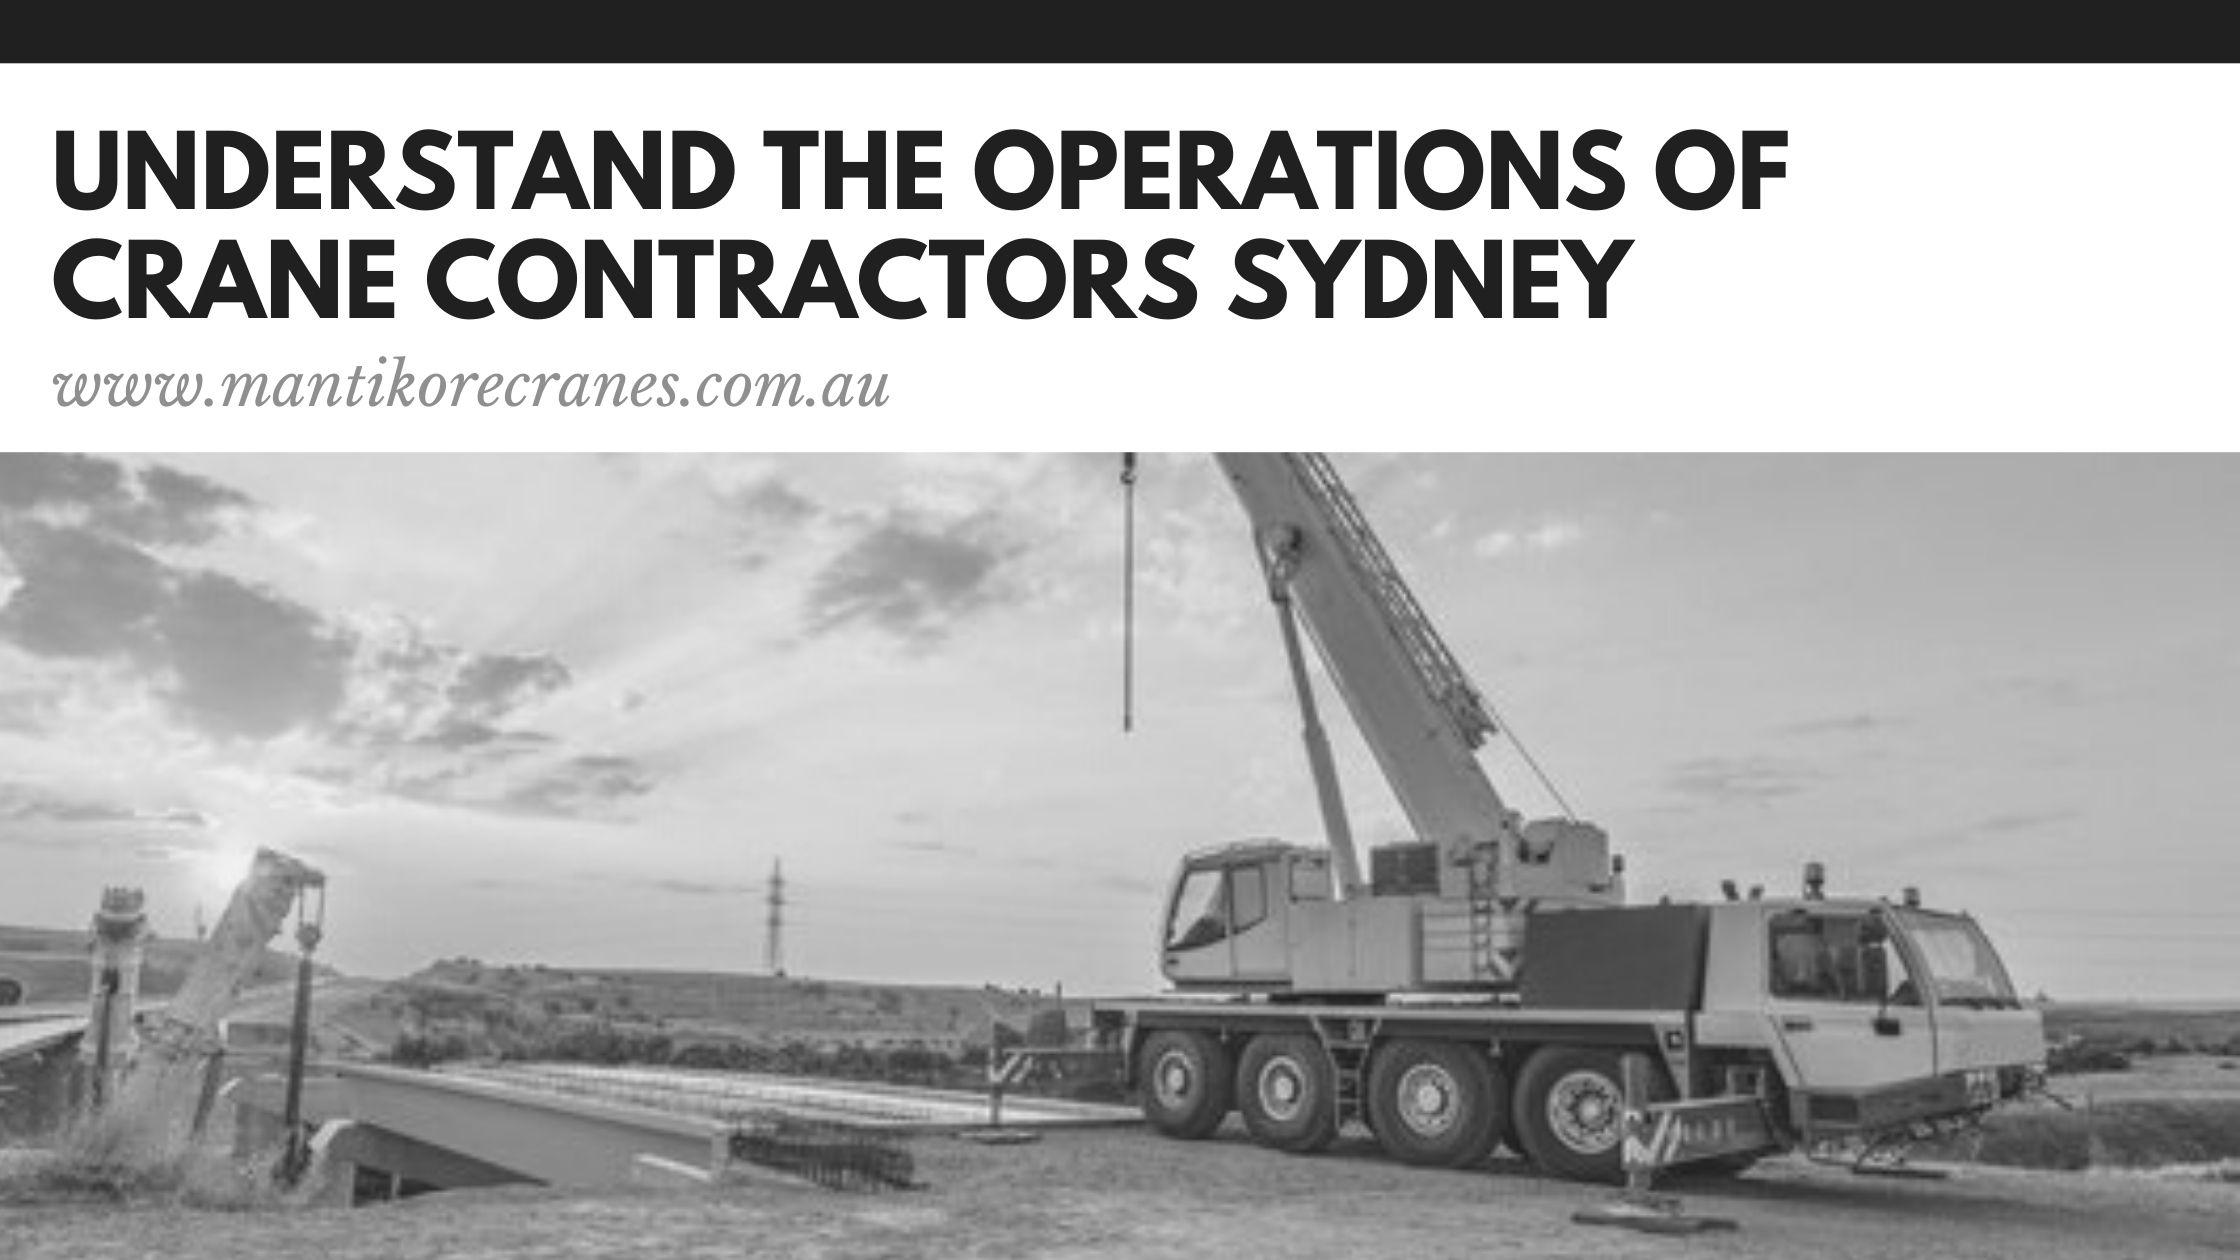 Understand the operations of crane contractors Sydney